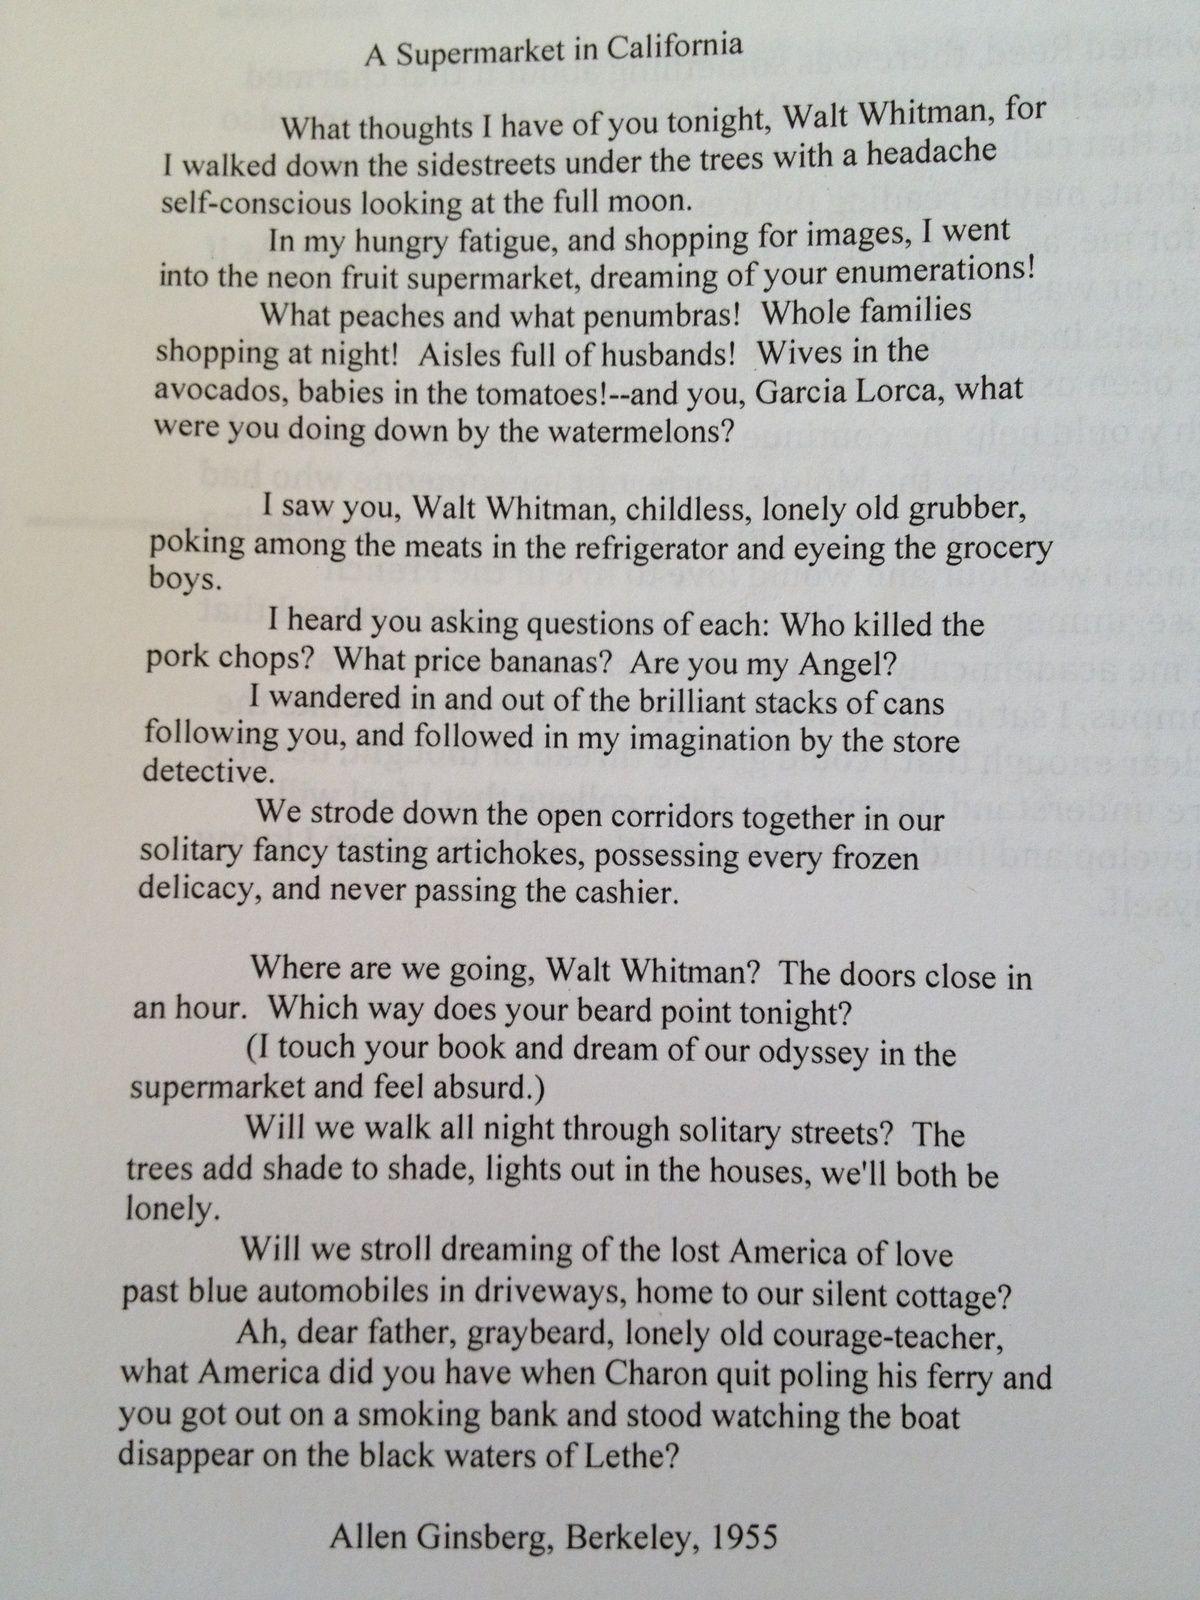 a supermarket in california poem